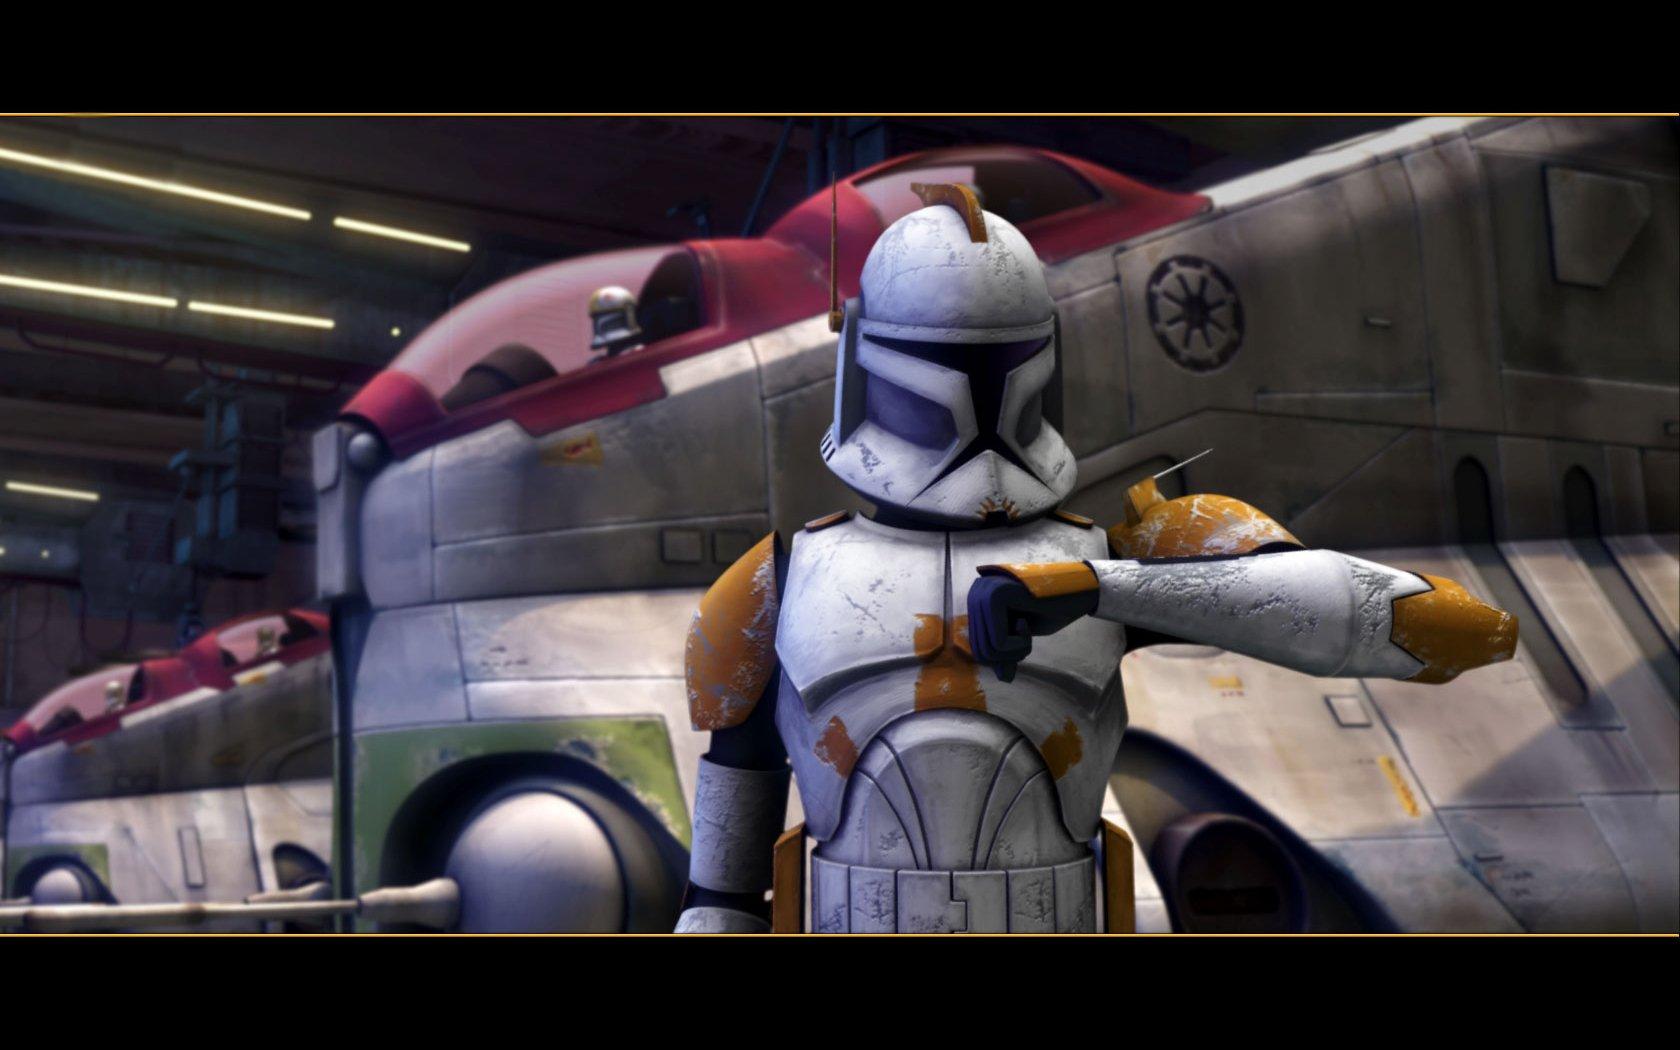 Star Wars Clone Wars Clone Trooper Commander Cody Wallpaper